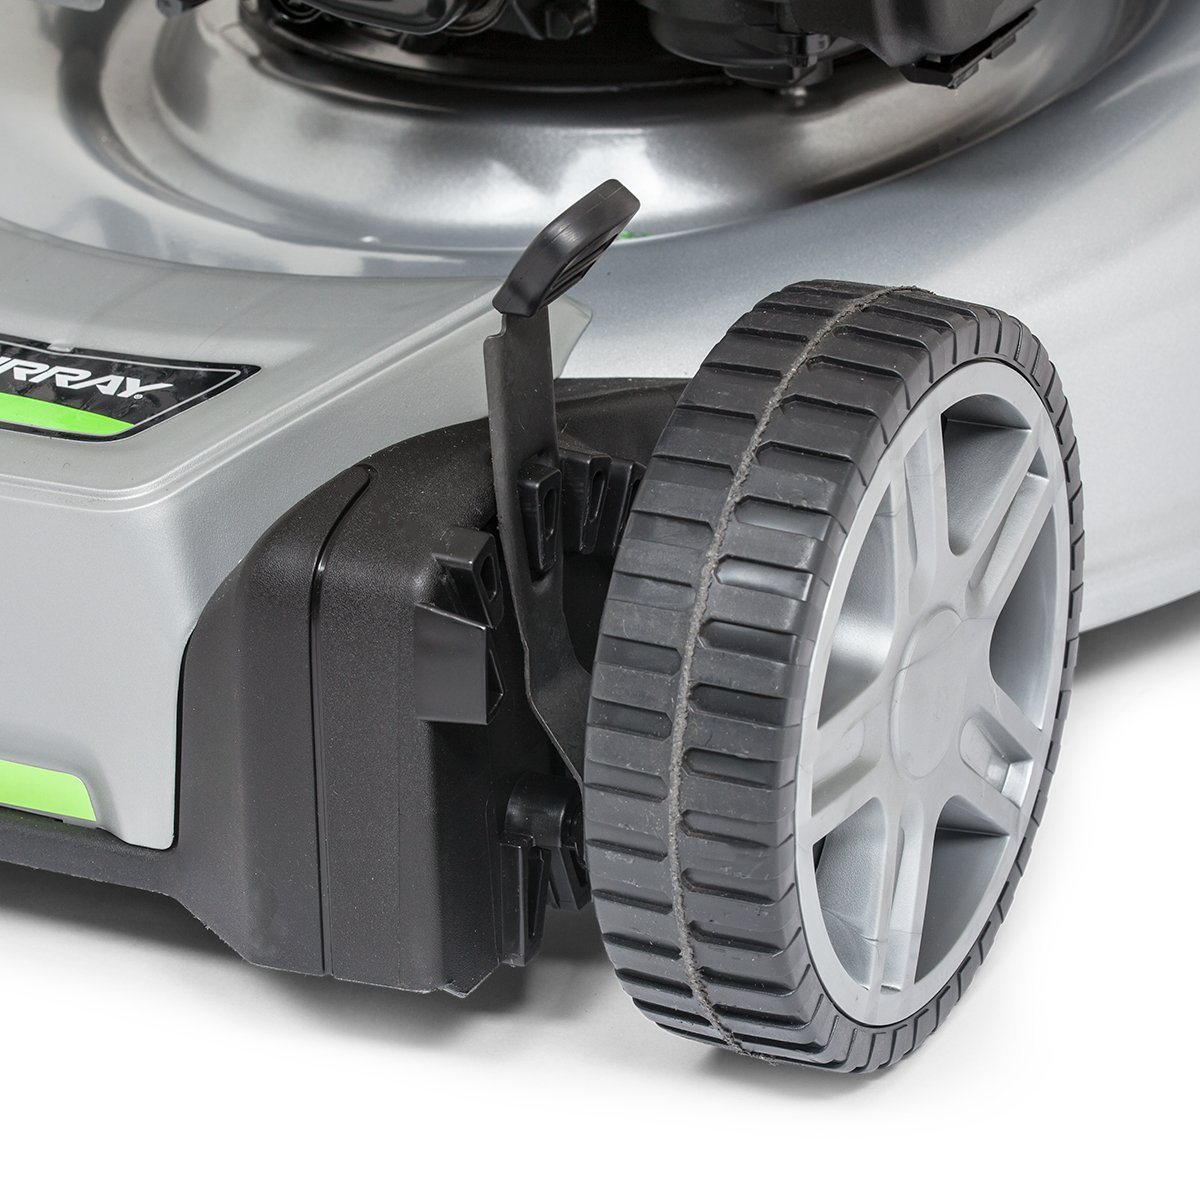 Murray EQ200 Cortac/ésped Manual de Gasolina de Empuje de 16//41 cm con Motor Briggs /& Stratton 300E Series Gris